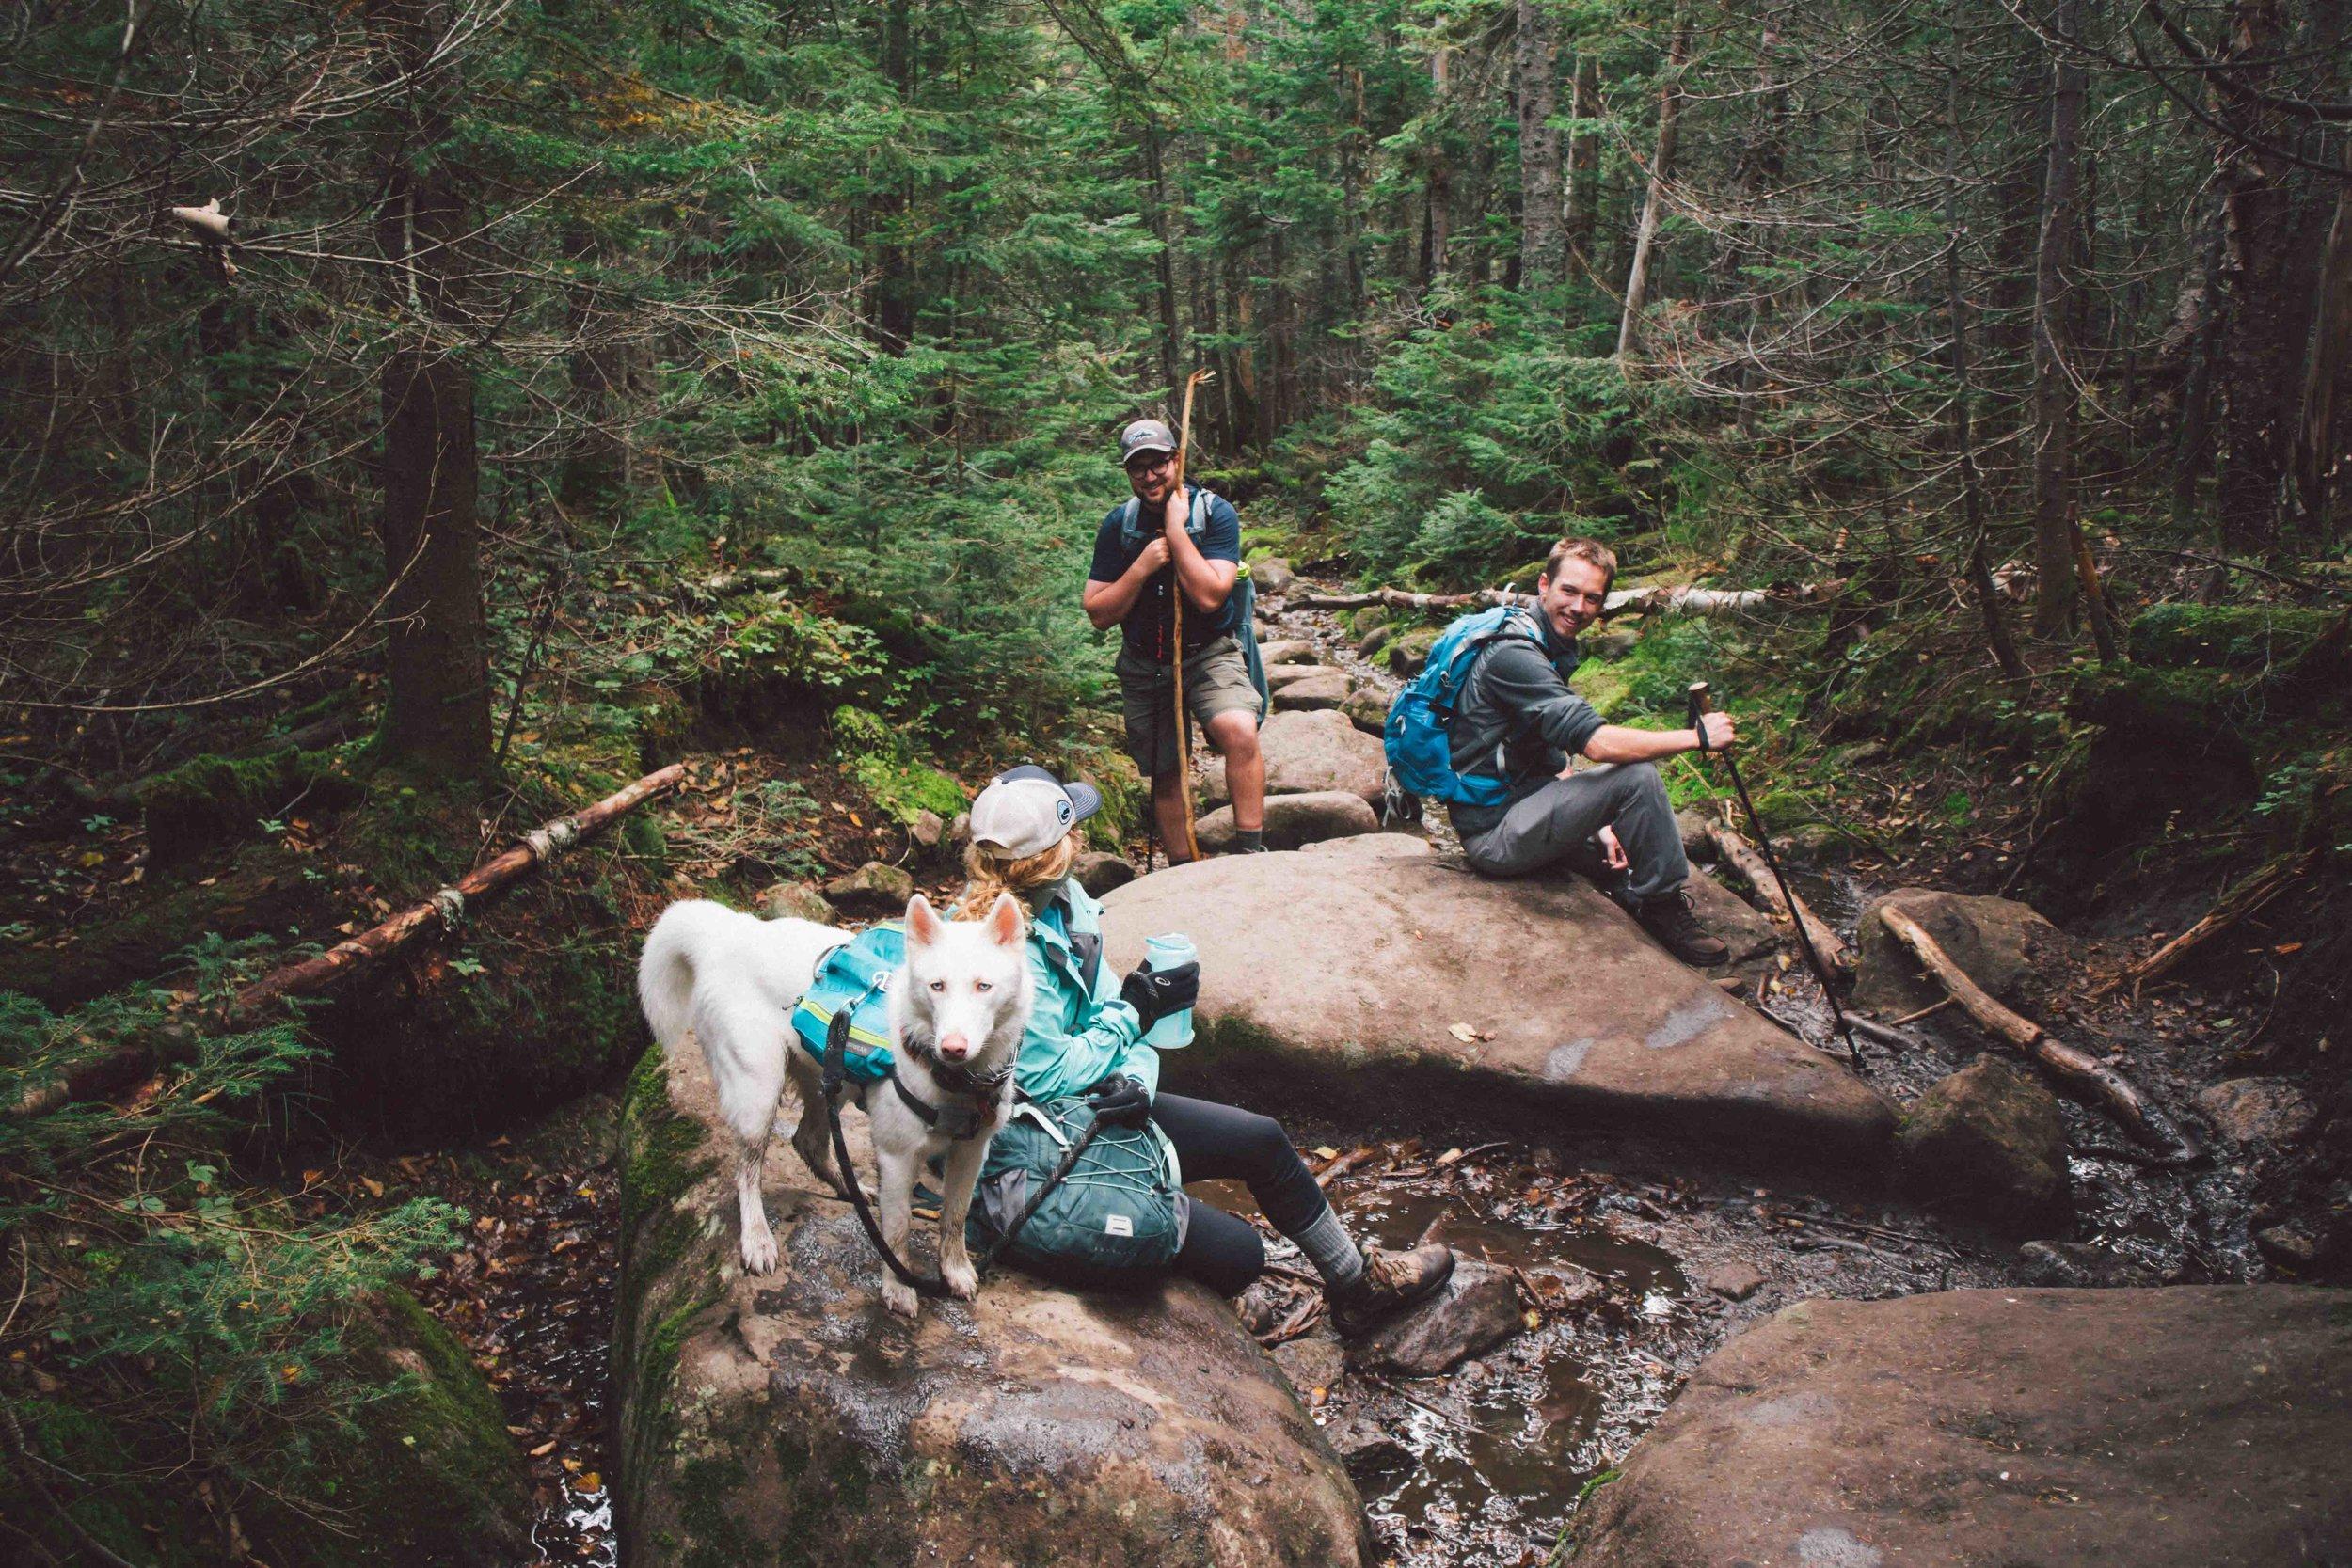 Adirondacks-2018-web-84-Mount-Marcy.jpg